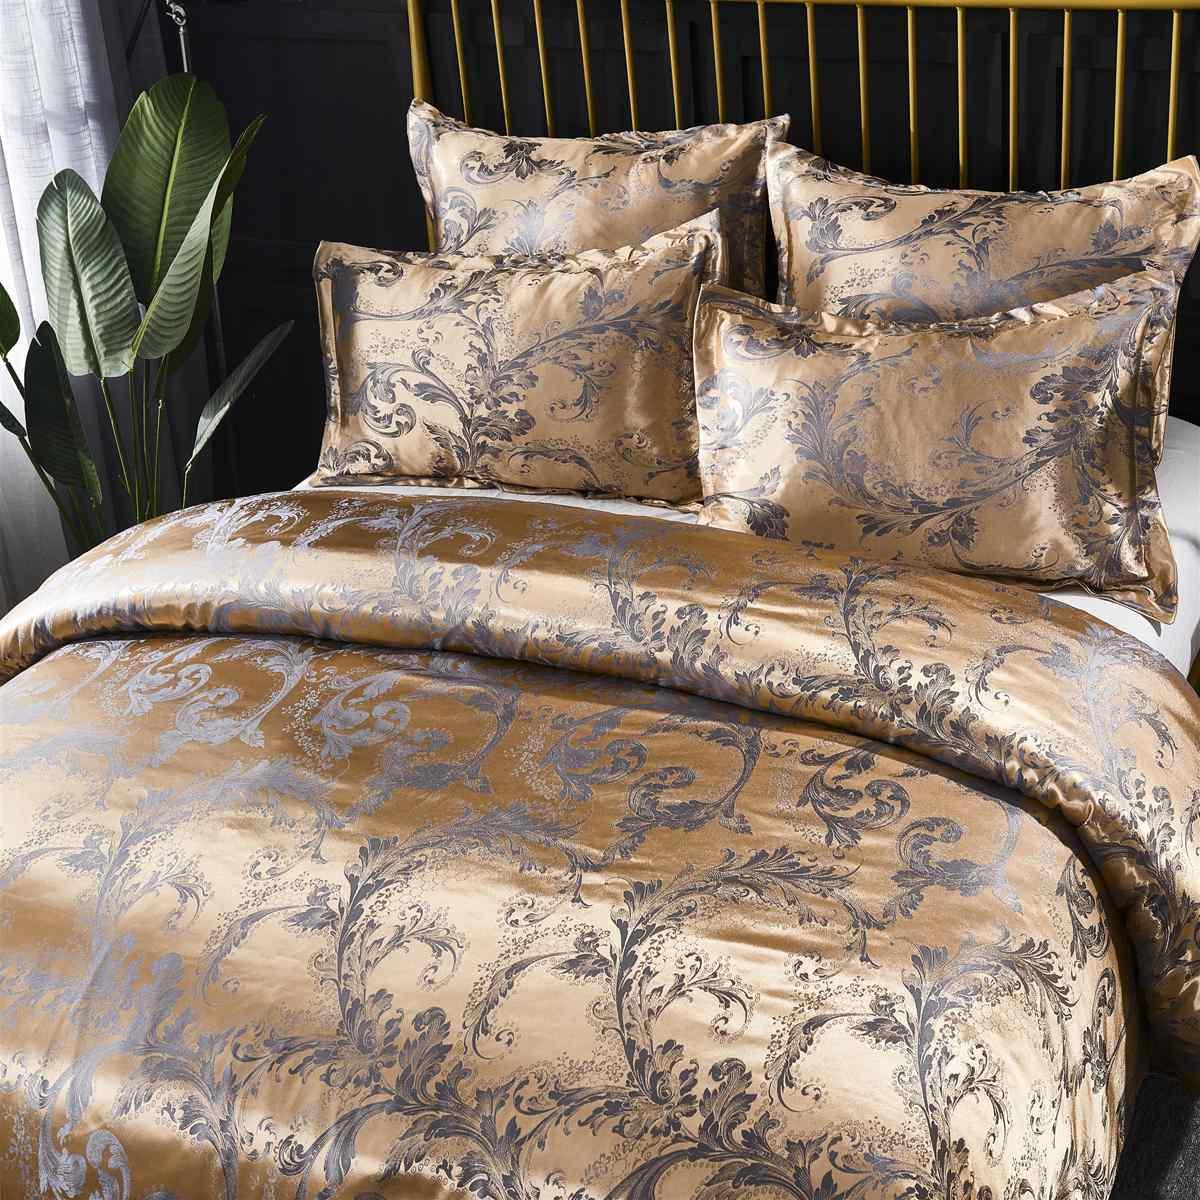 Luxury Jacquard Bedding Set King Queen Size 2/3 Bed Linen Silk Duvet Cover Set Pillowcases